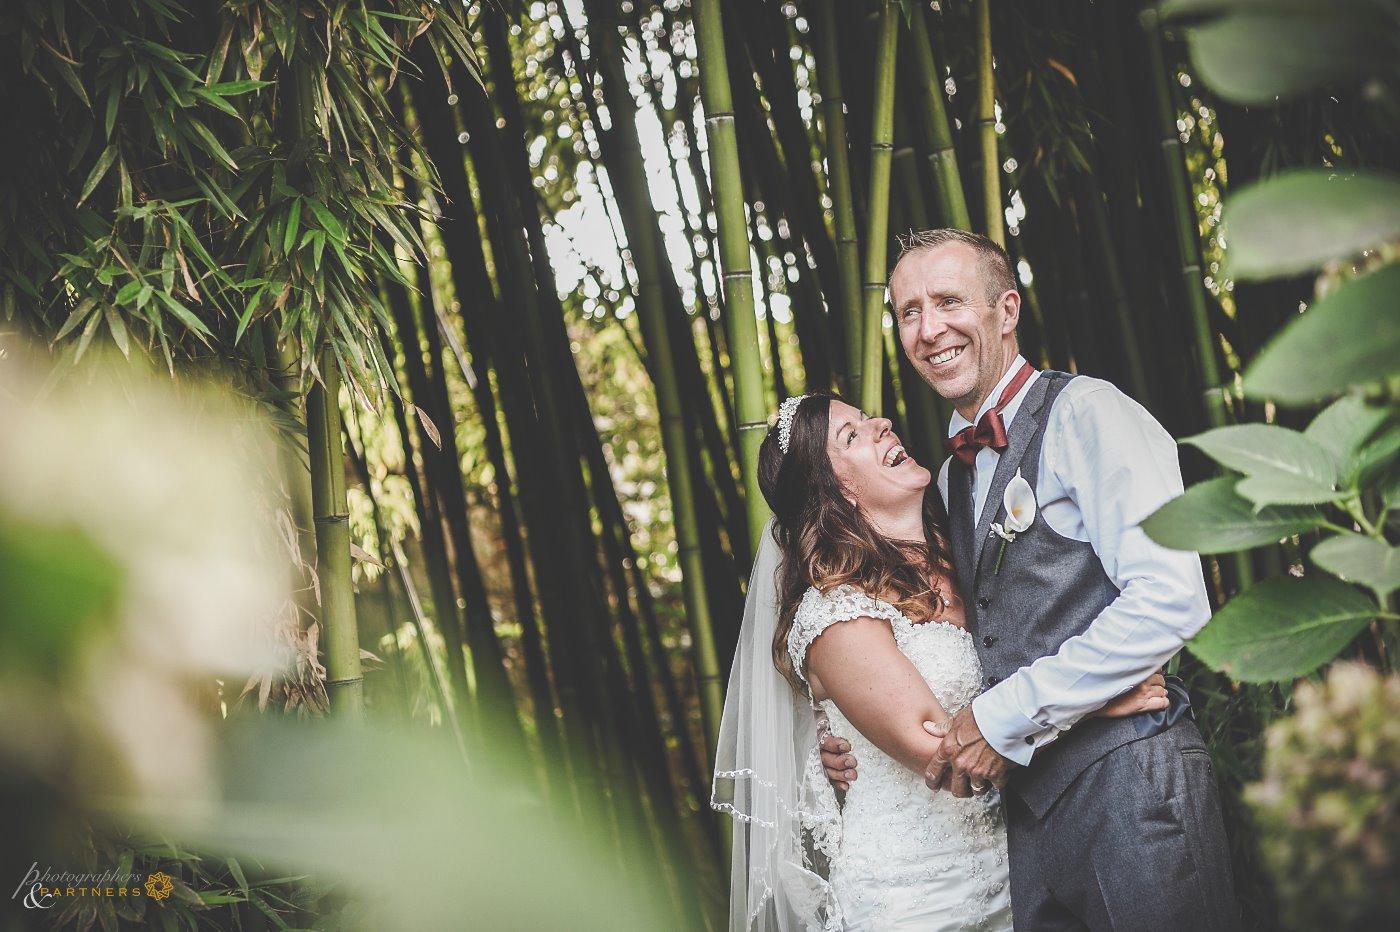 photography_weddings_lucca_18.jpg